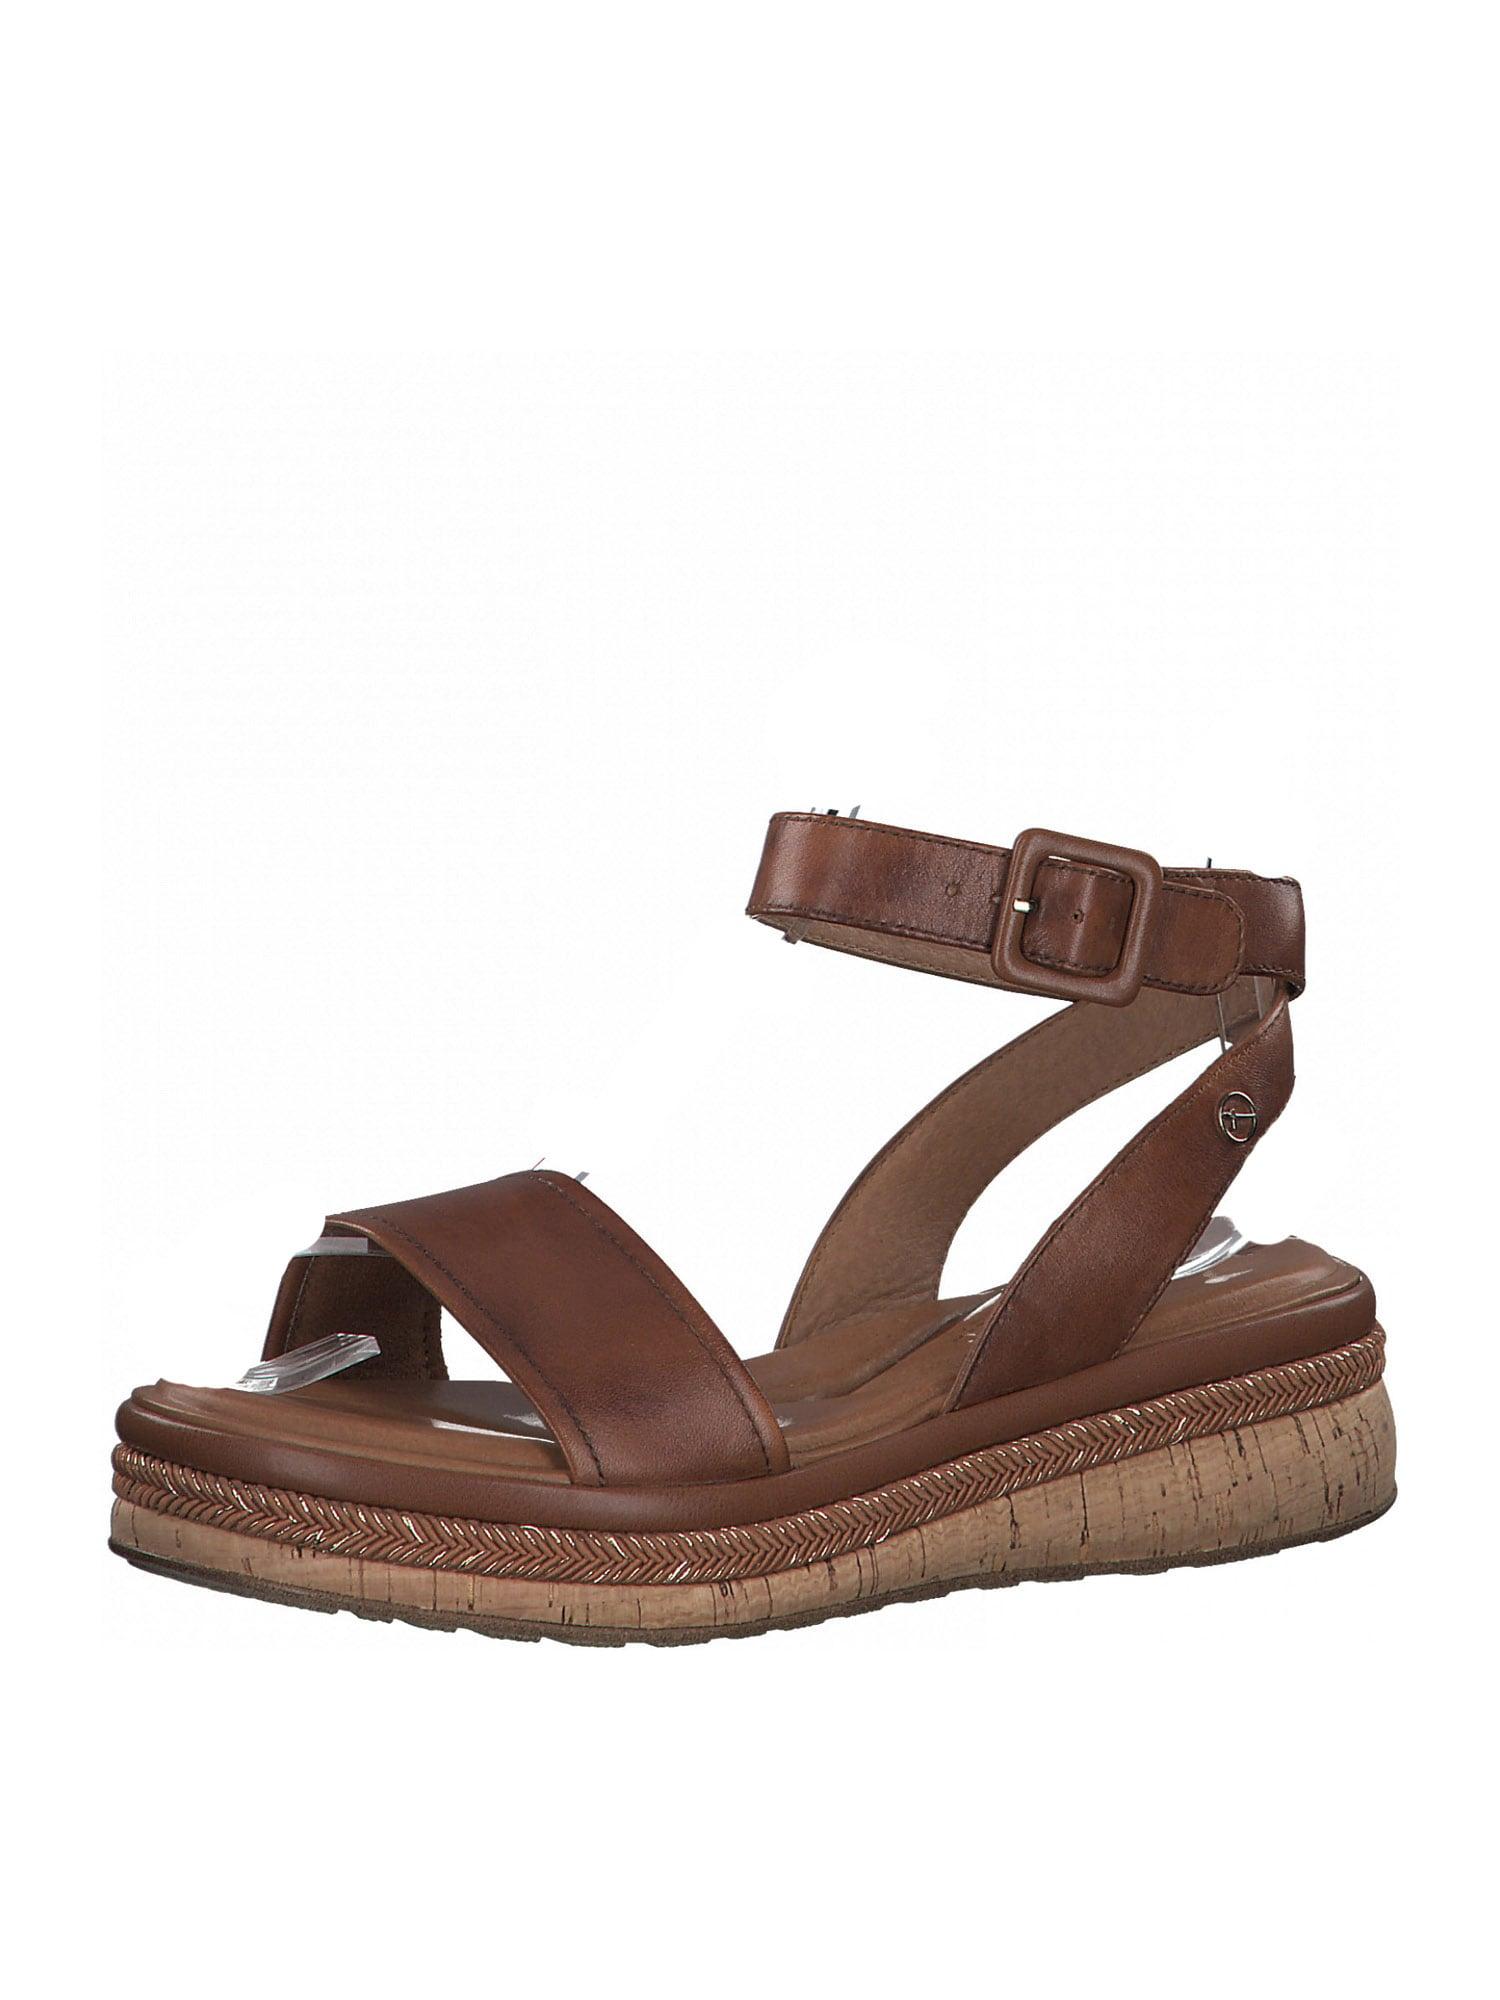 TAMARIS Páskové sandály  karamelová / stříbrná